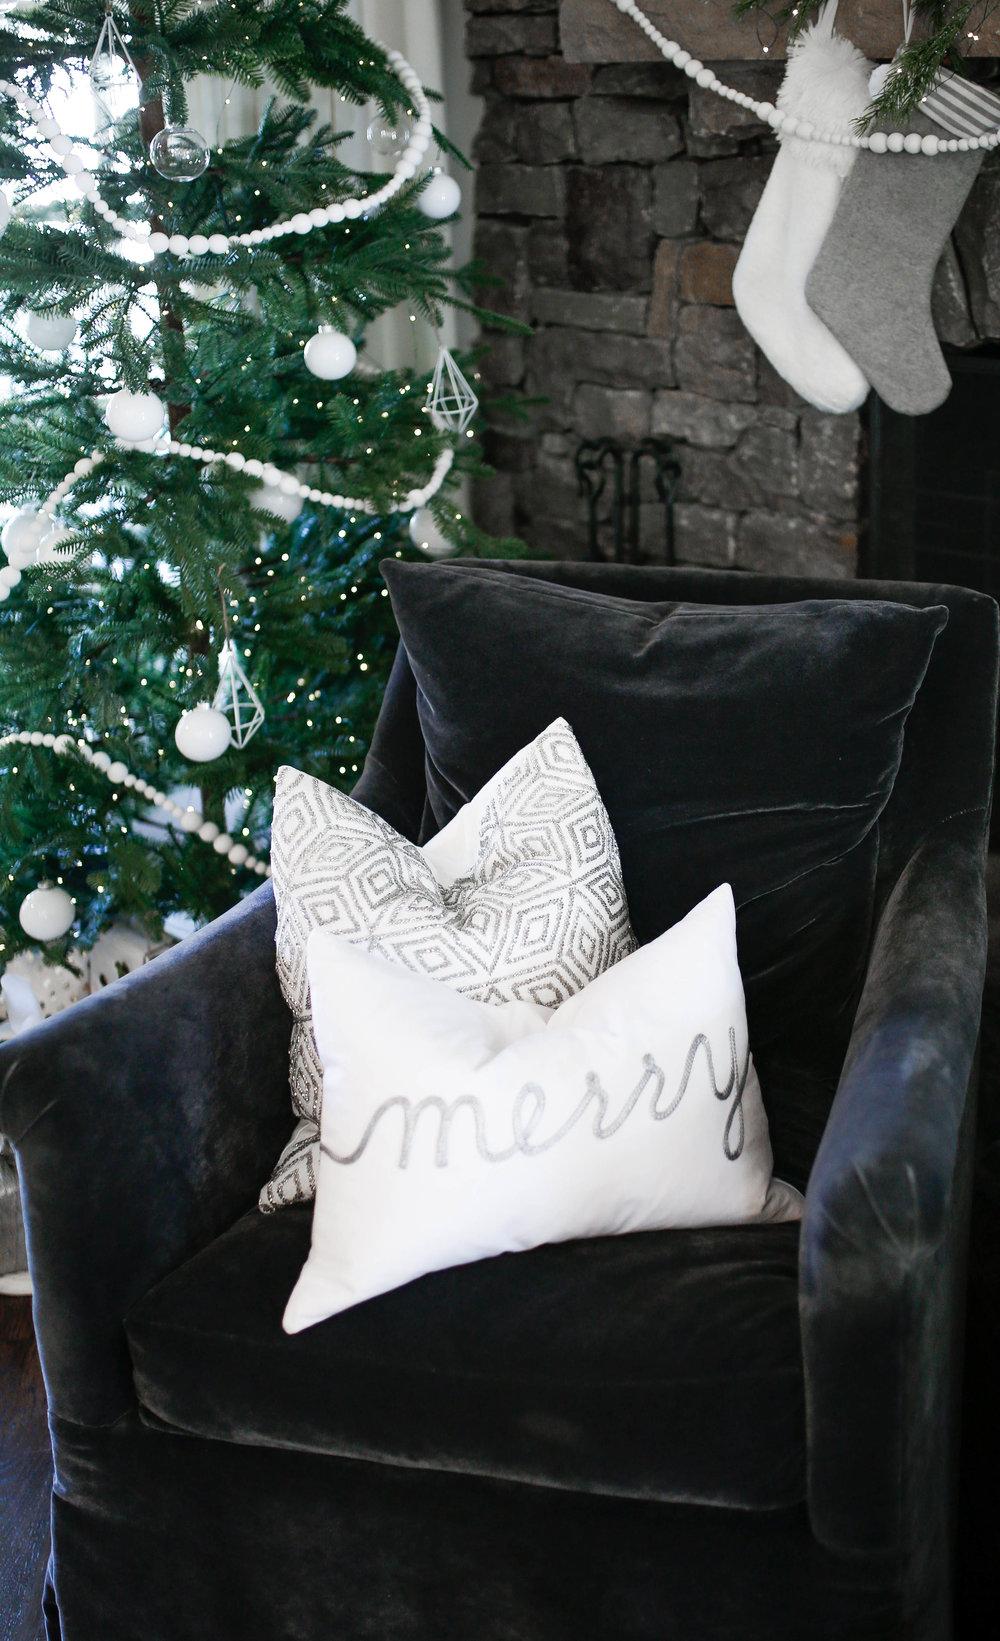 merry pillow in kitchen chair.jpg